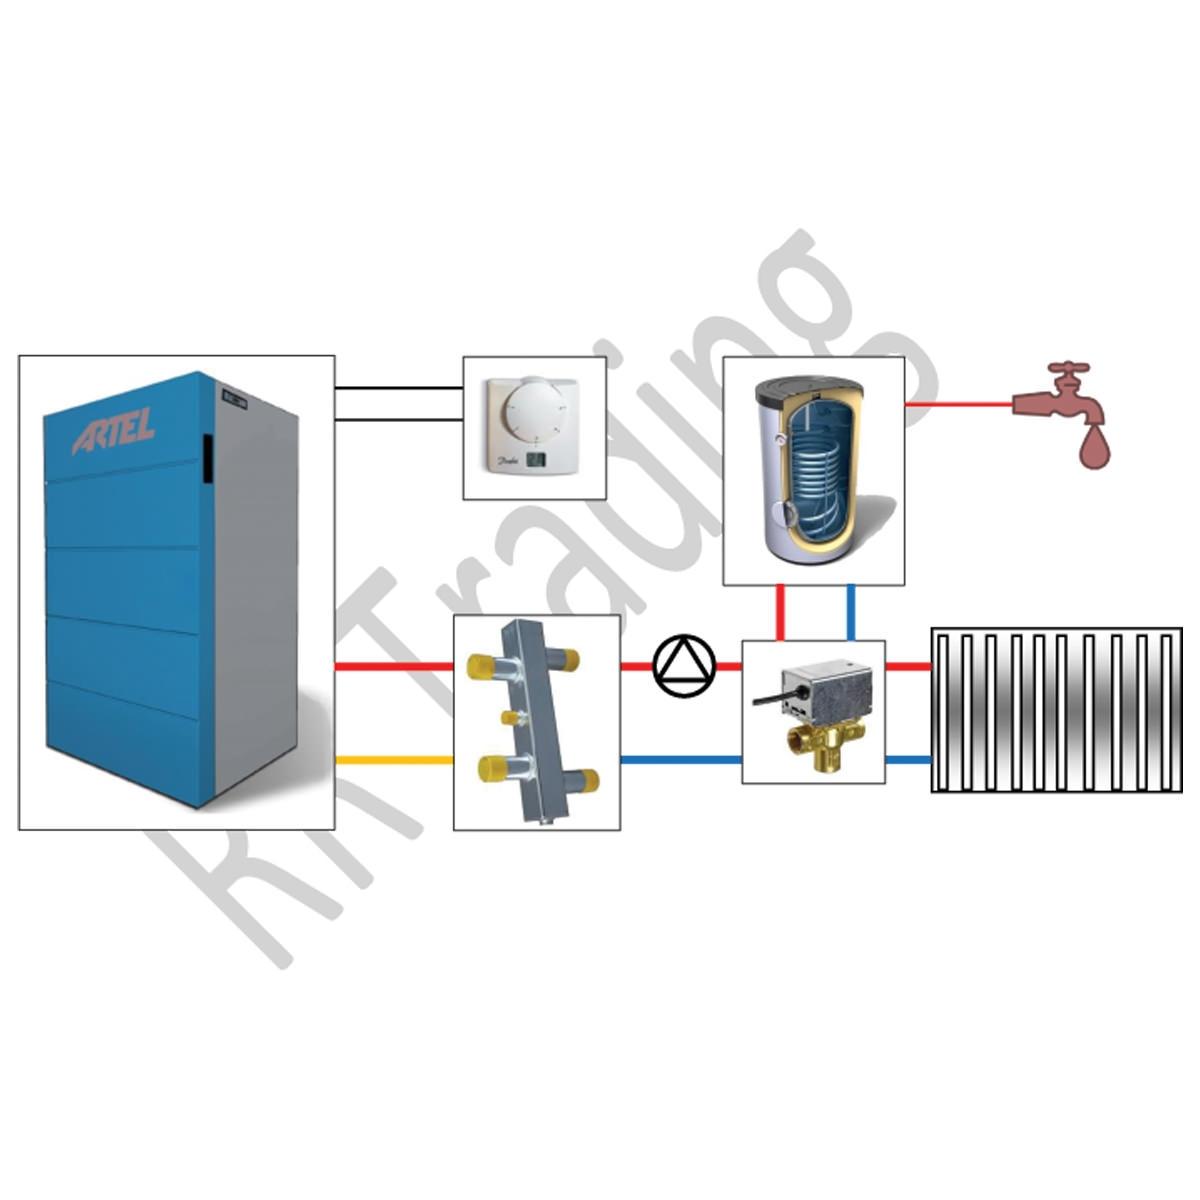 Pellet cv met openverdeler en indirect gestookte boiler